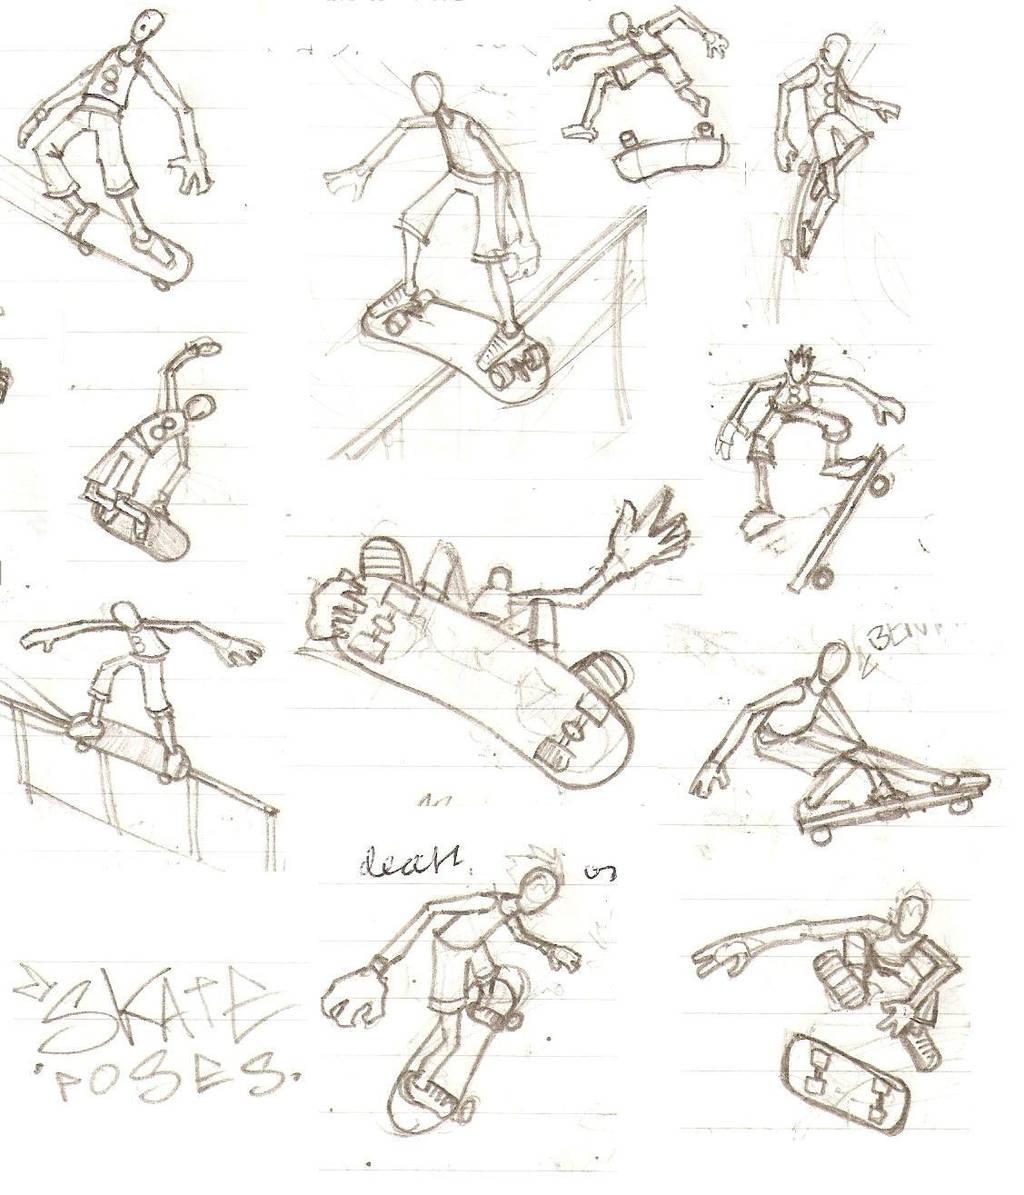 skate poses by Tua